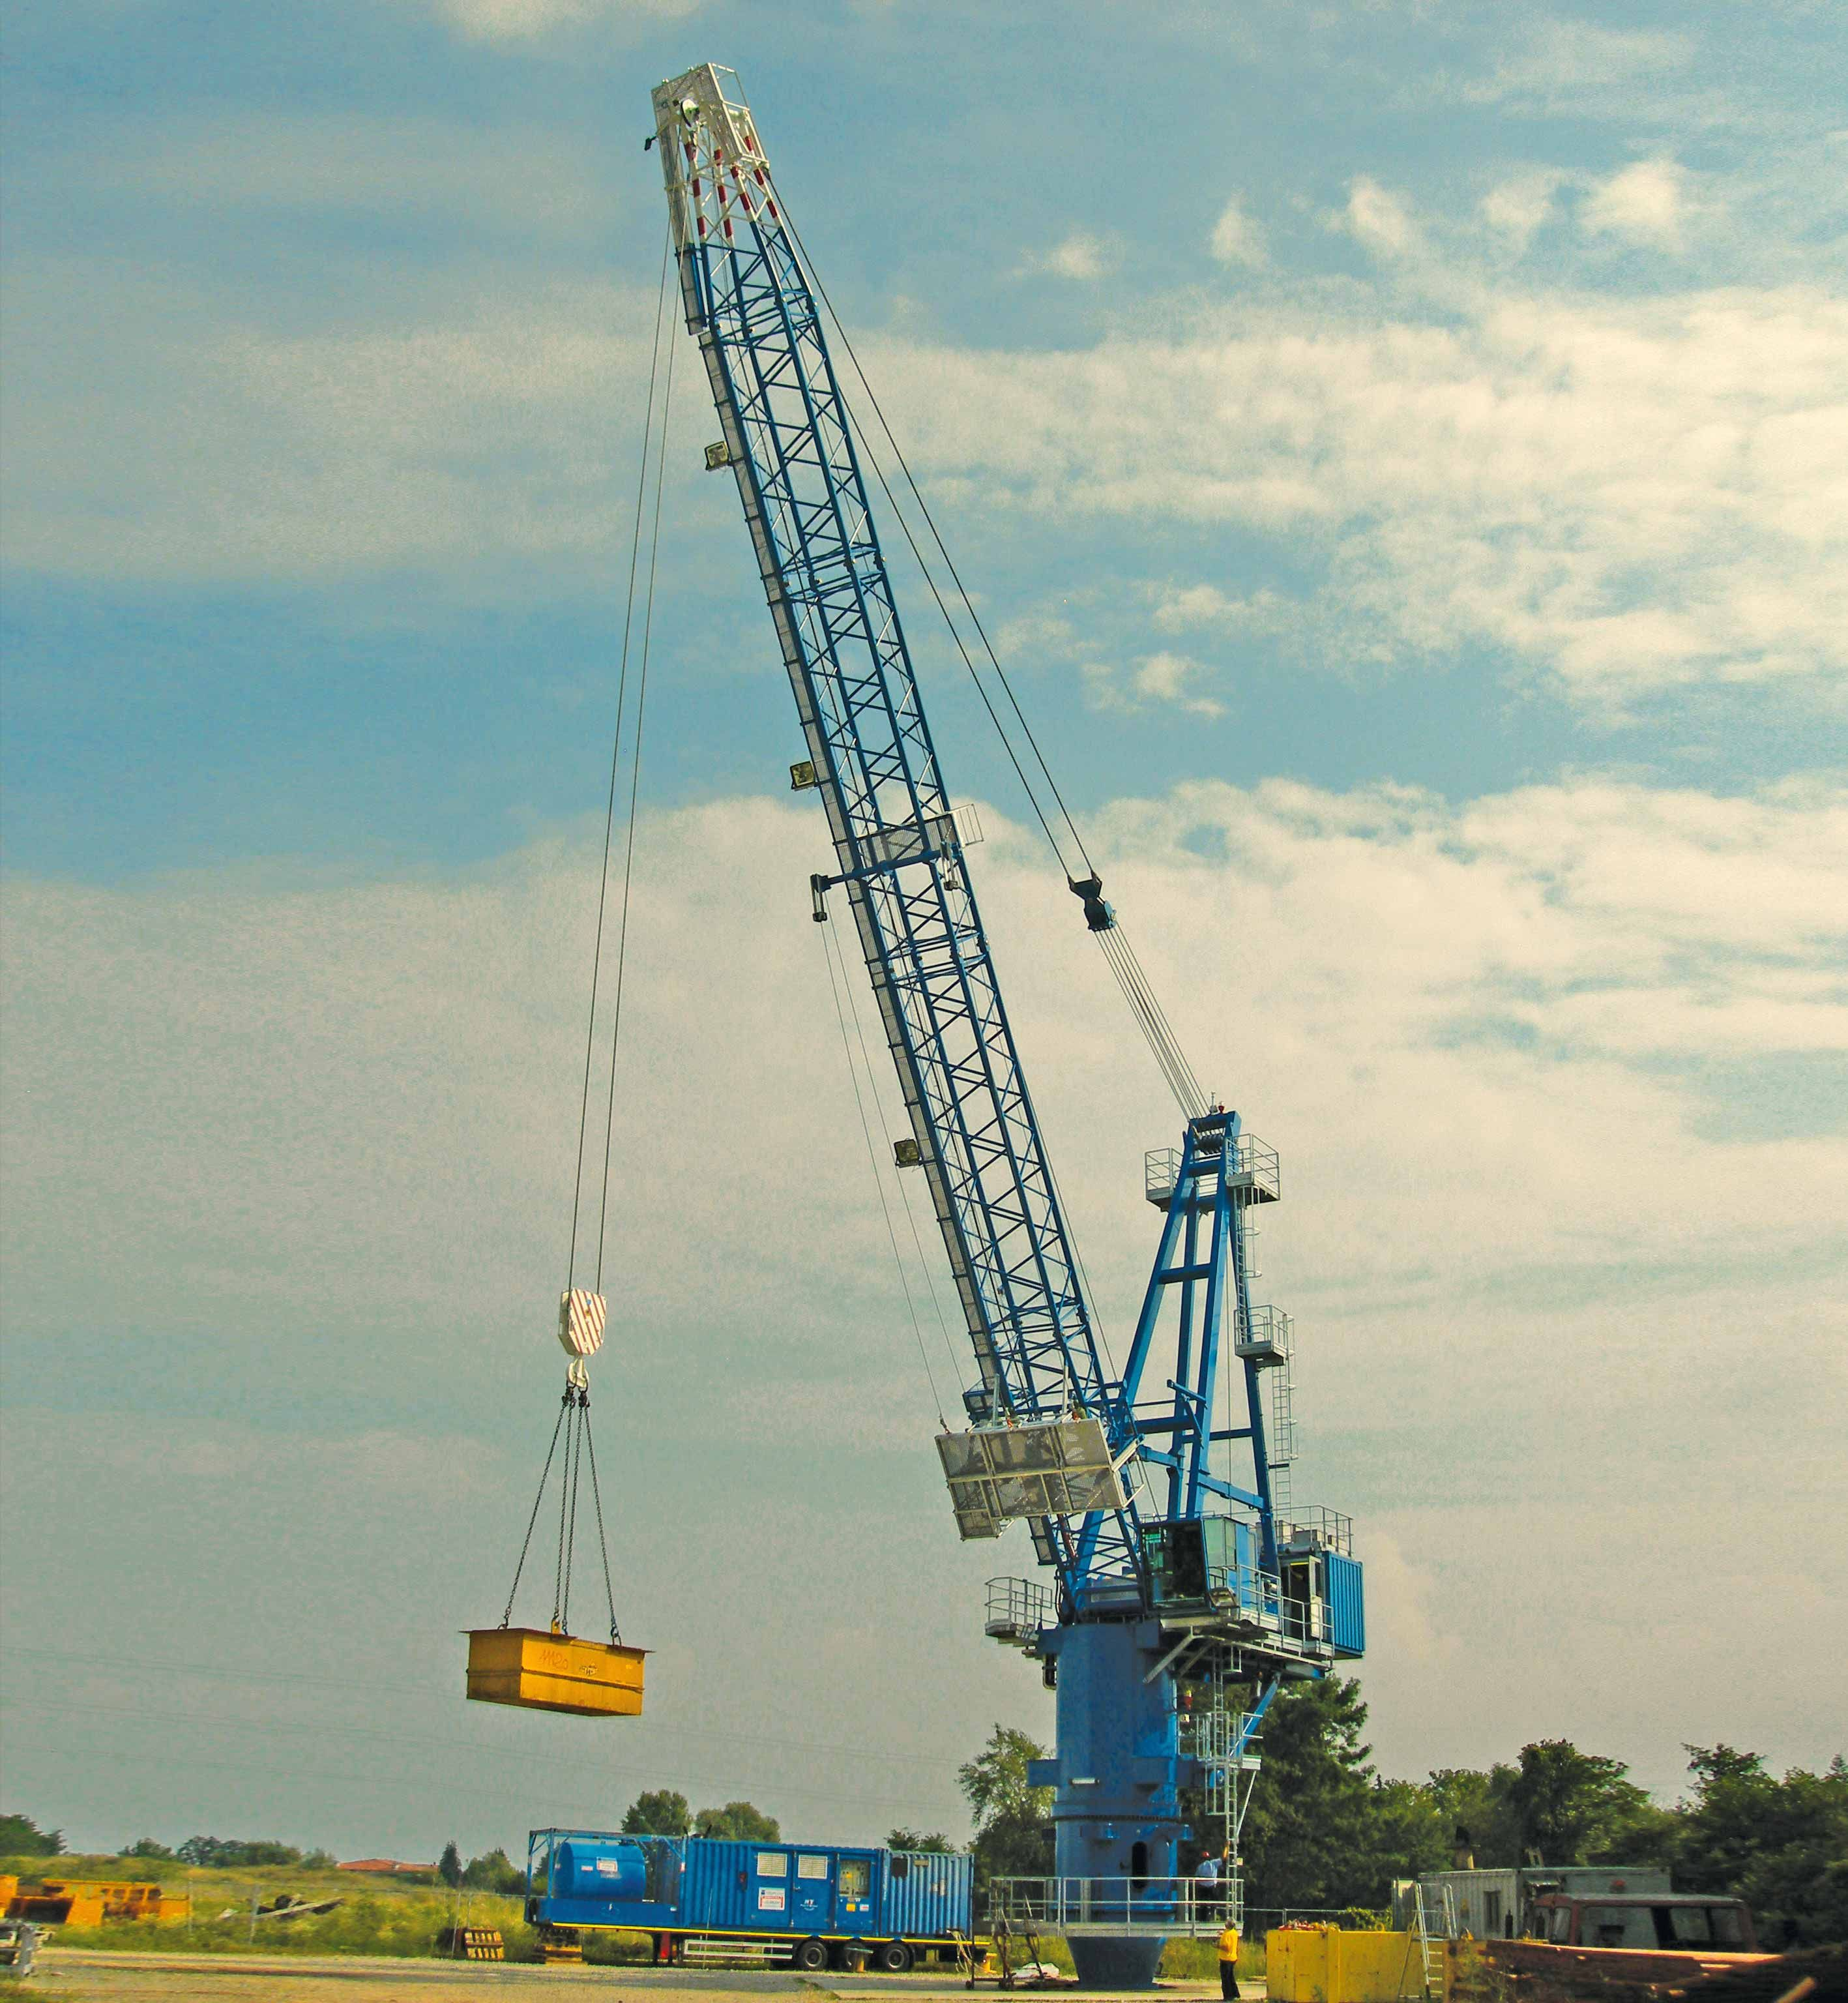 Ts Series Offshore Cranes